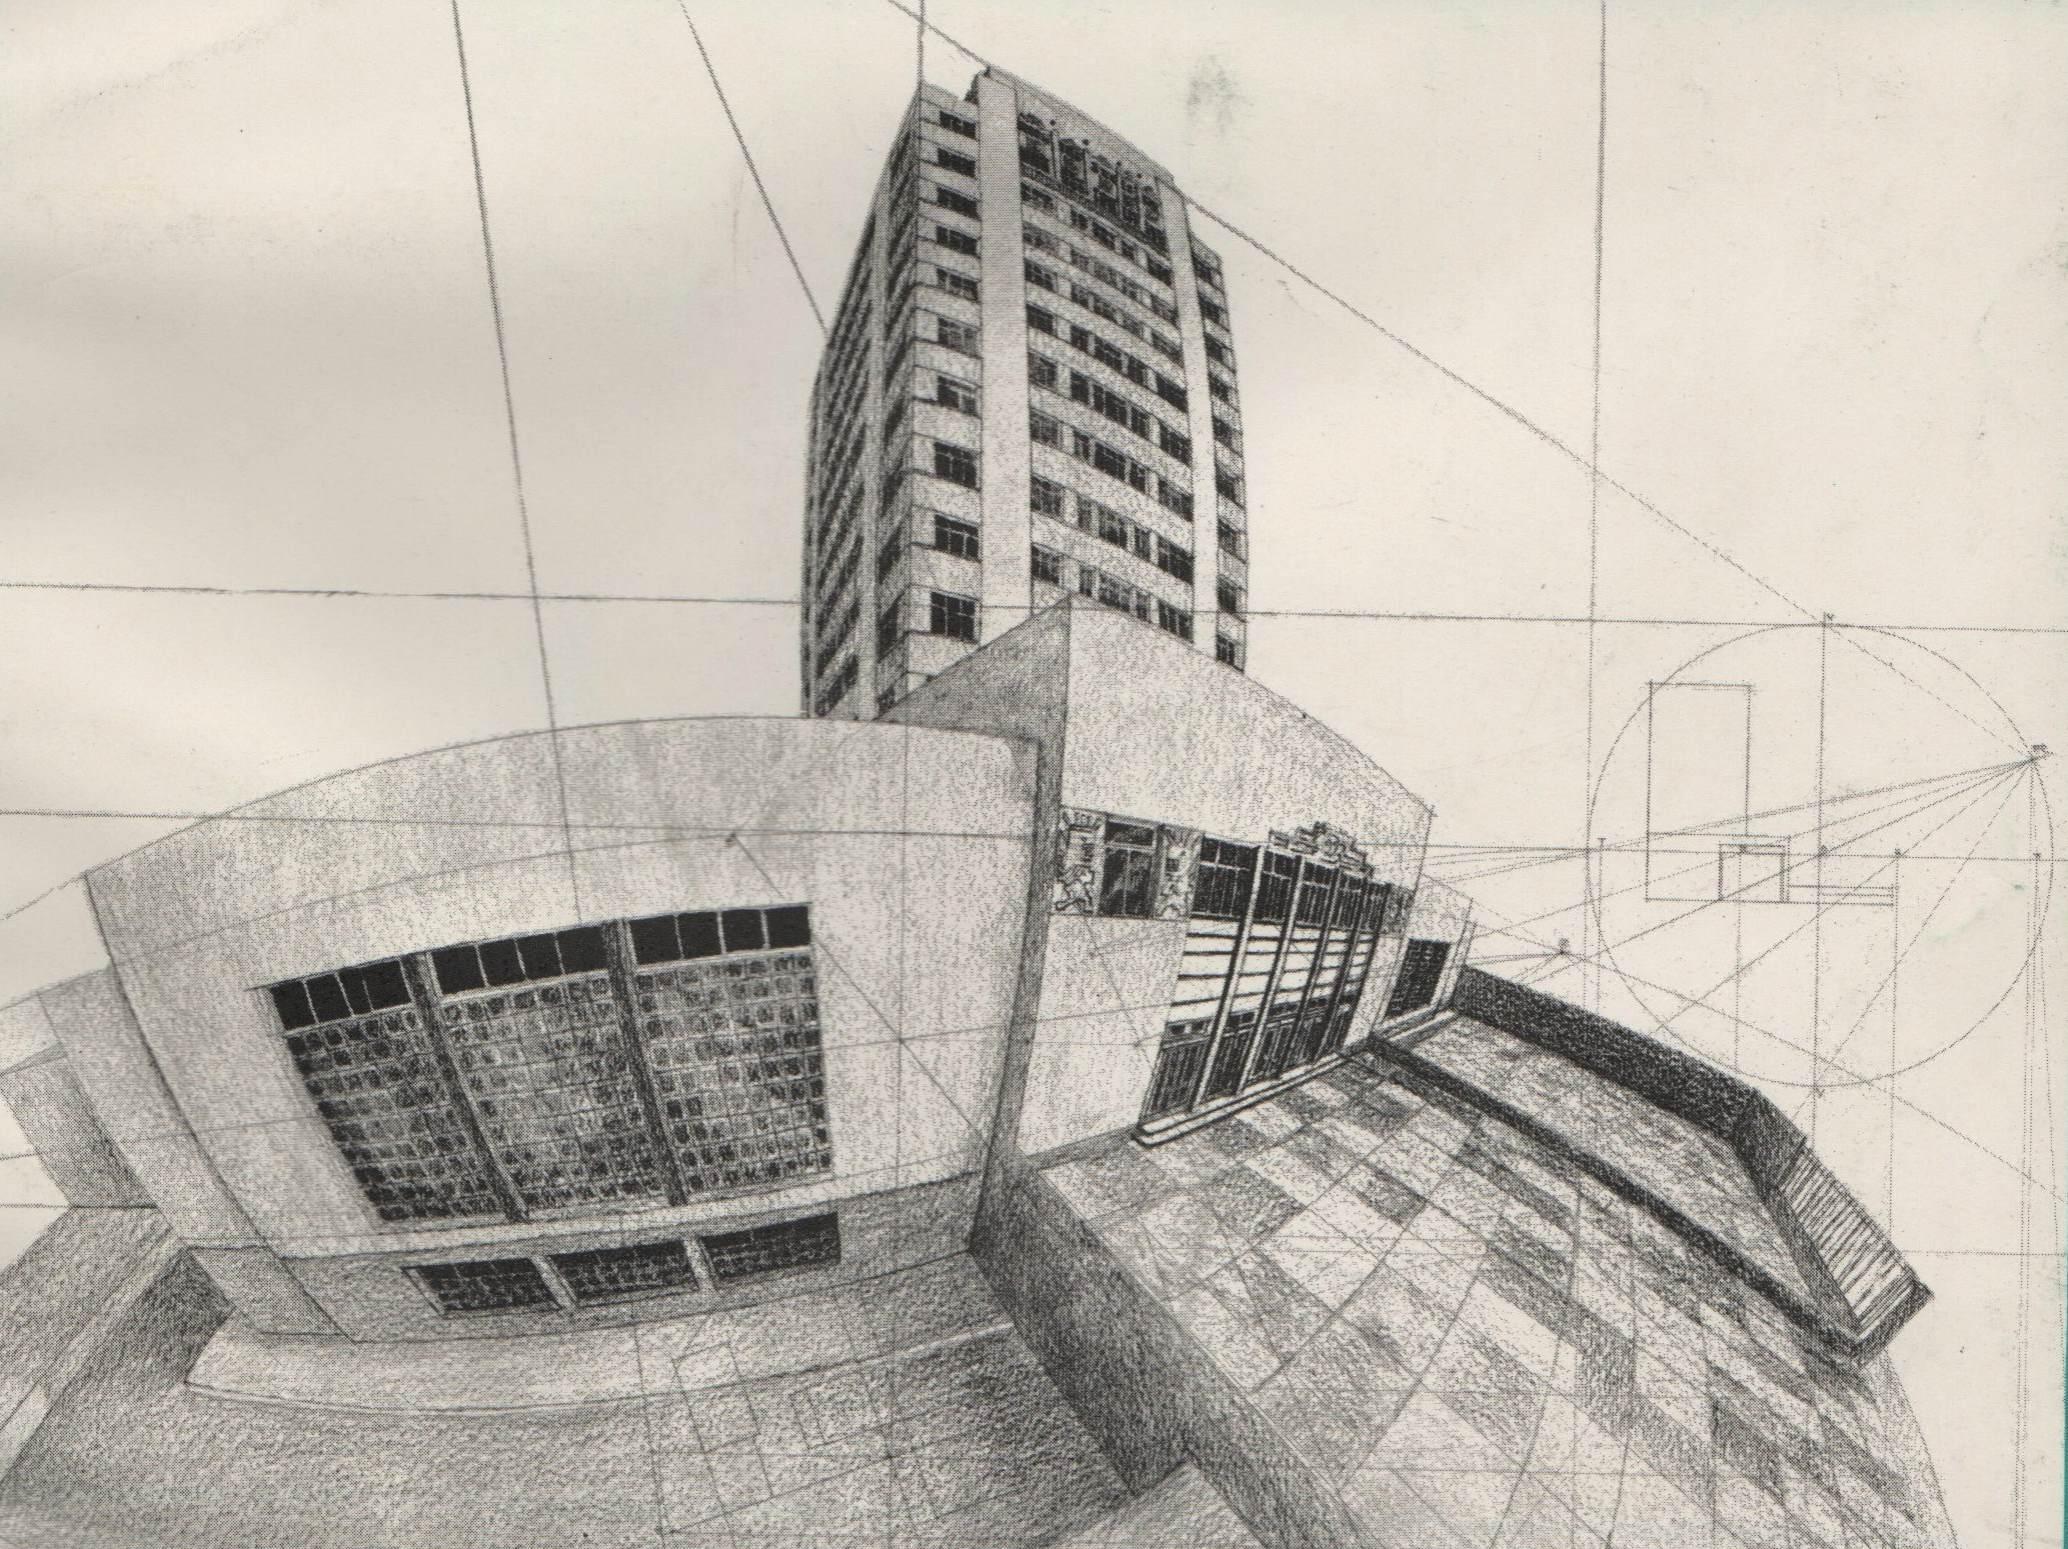 El monoblock de la umsa obra maestra de la arquitectura boliviana del s xx carlos diego de - Mesa de dibujo para arquitectura ...